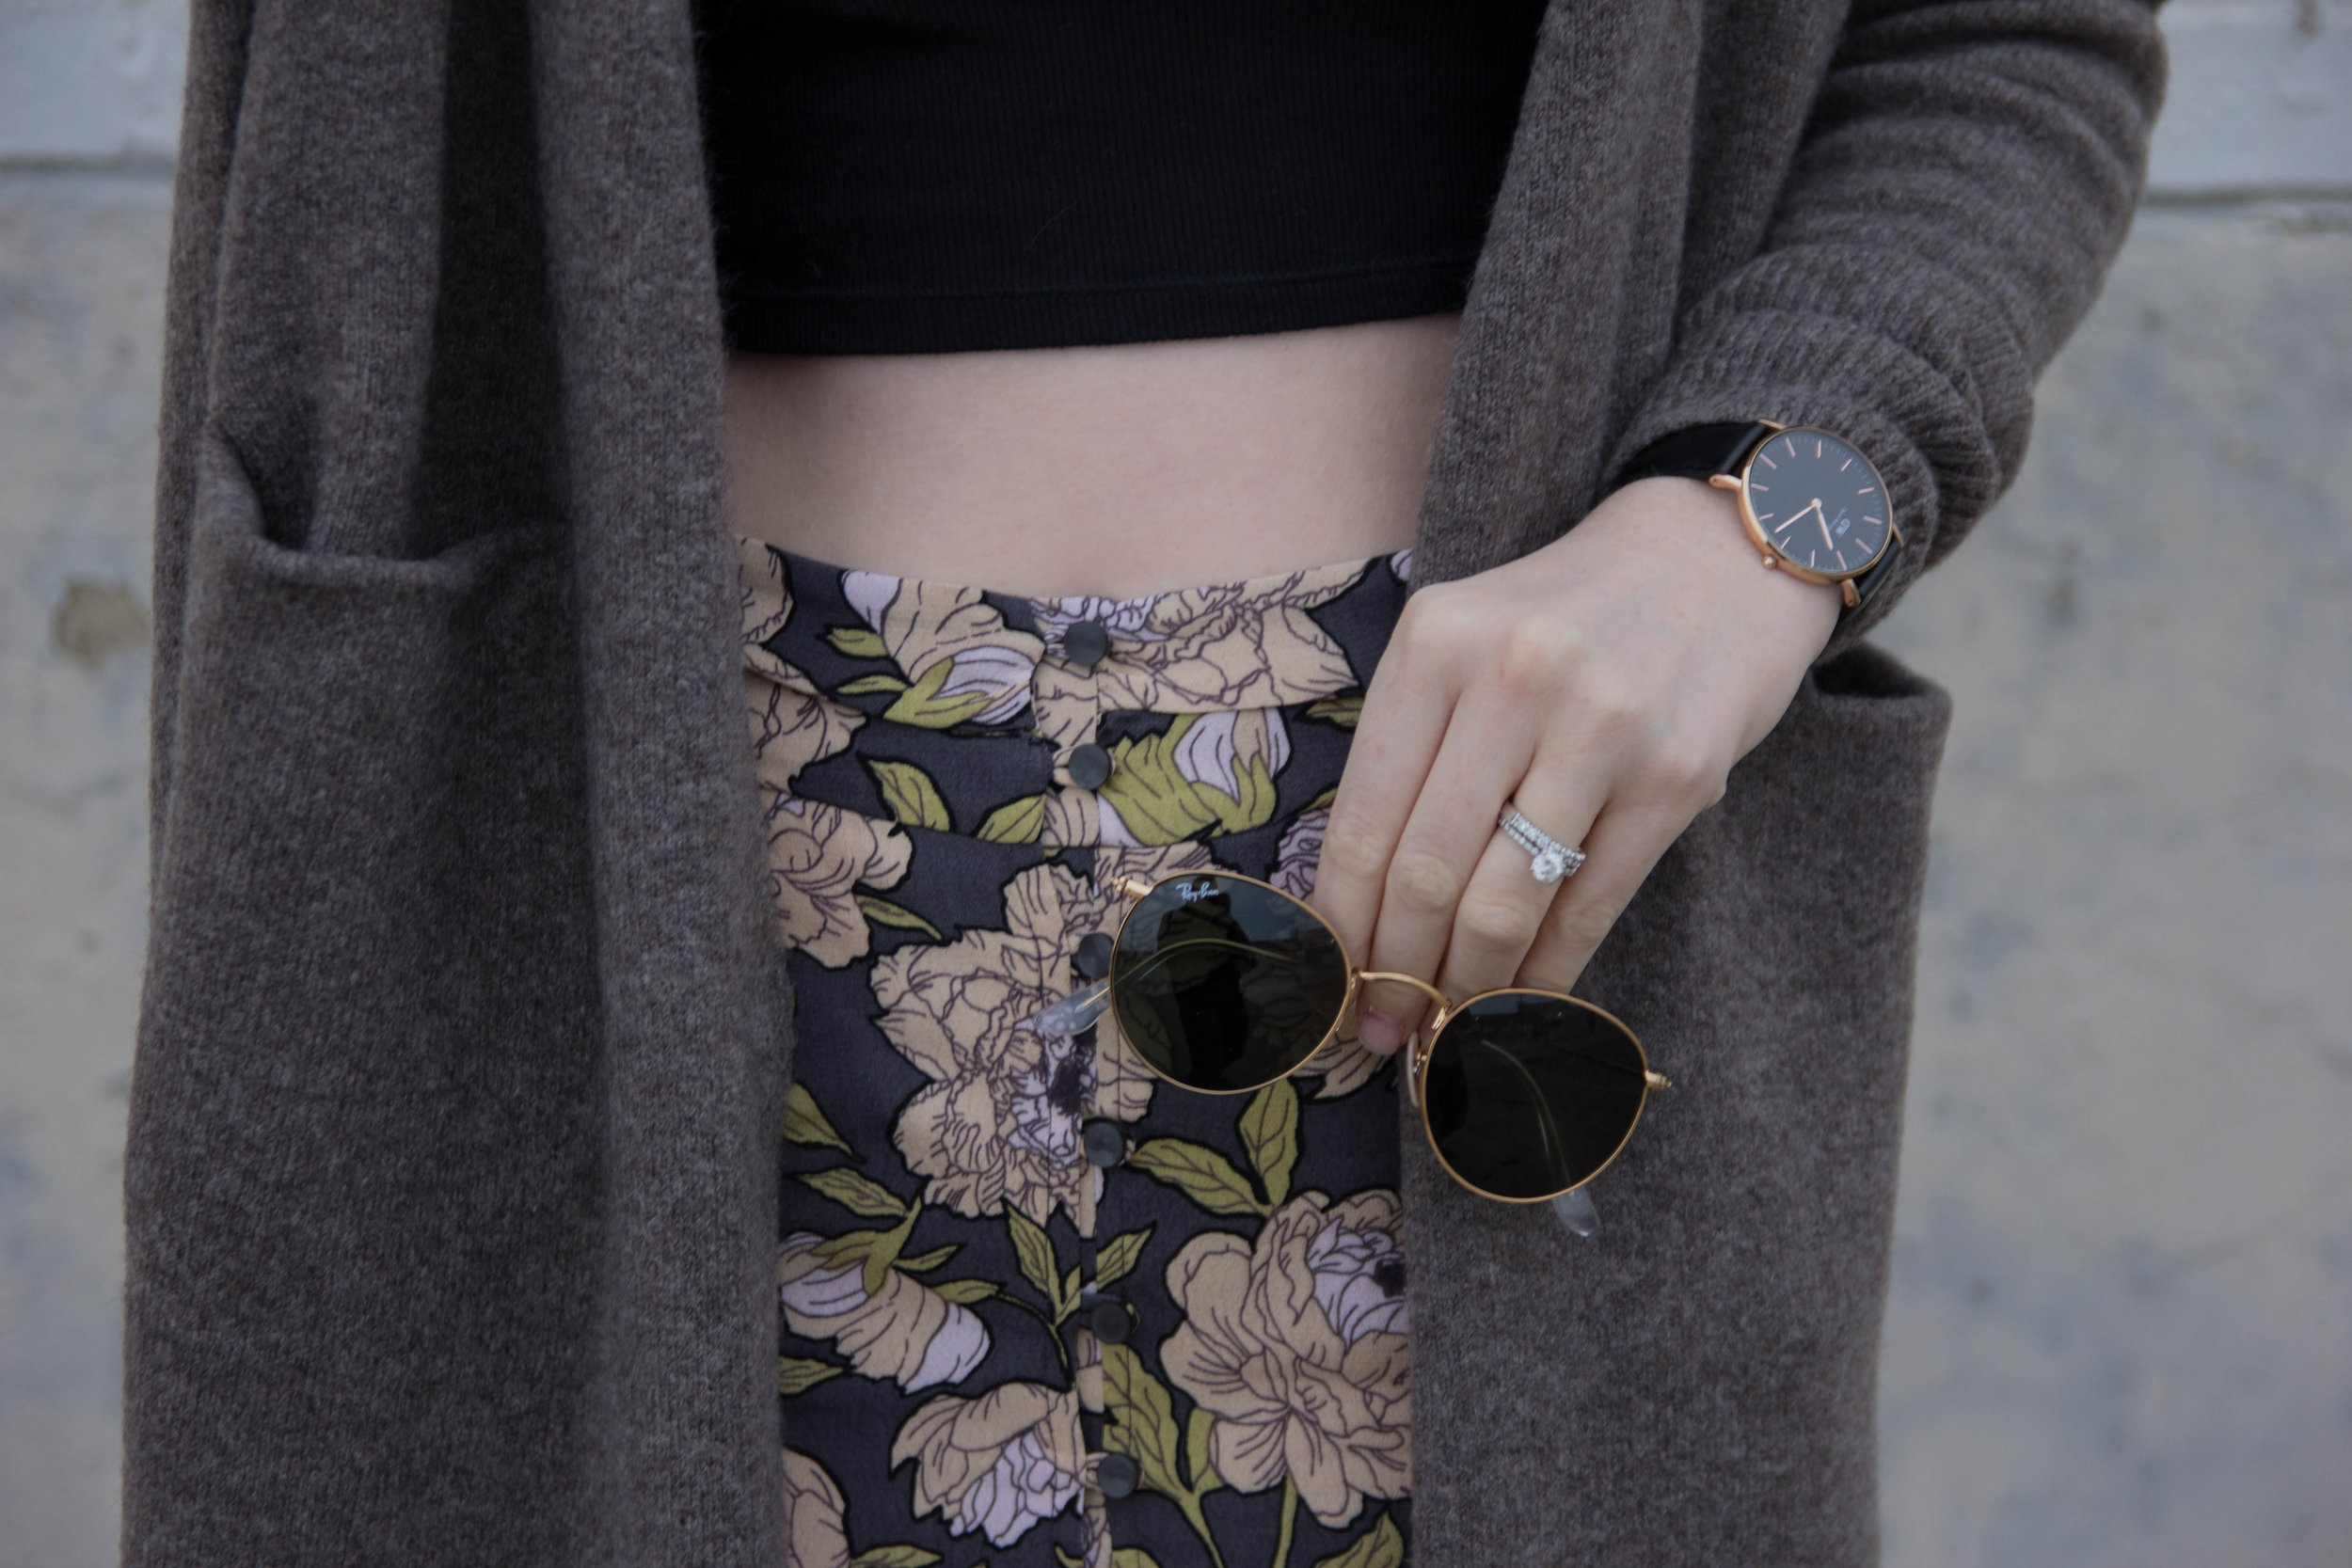 Ray-ban 50mm Aviator Sunglasses, daniel wellington classic black, madewell long cardigan, vince camuto kayleena tassel platform loafer, marc fisher annie wedges, floral flounc maxi skirt, trend alert, smaller round sunglasses